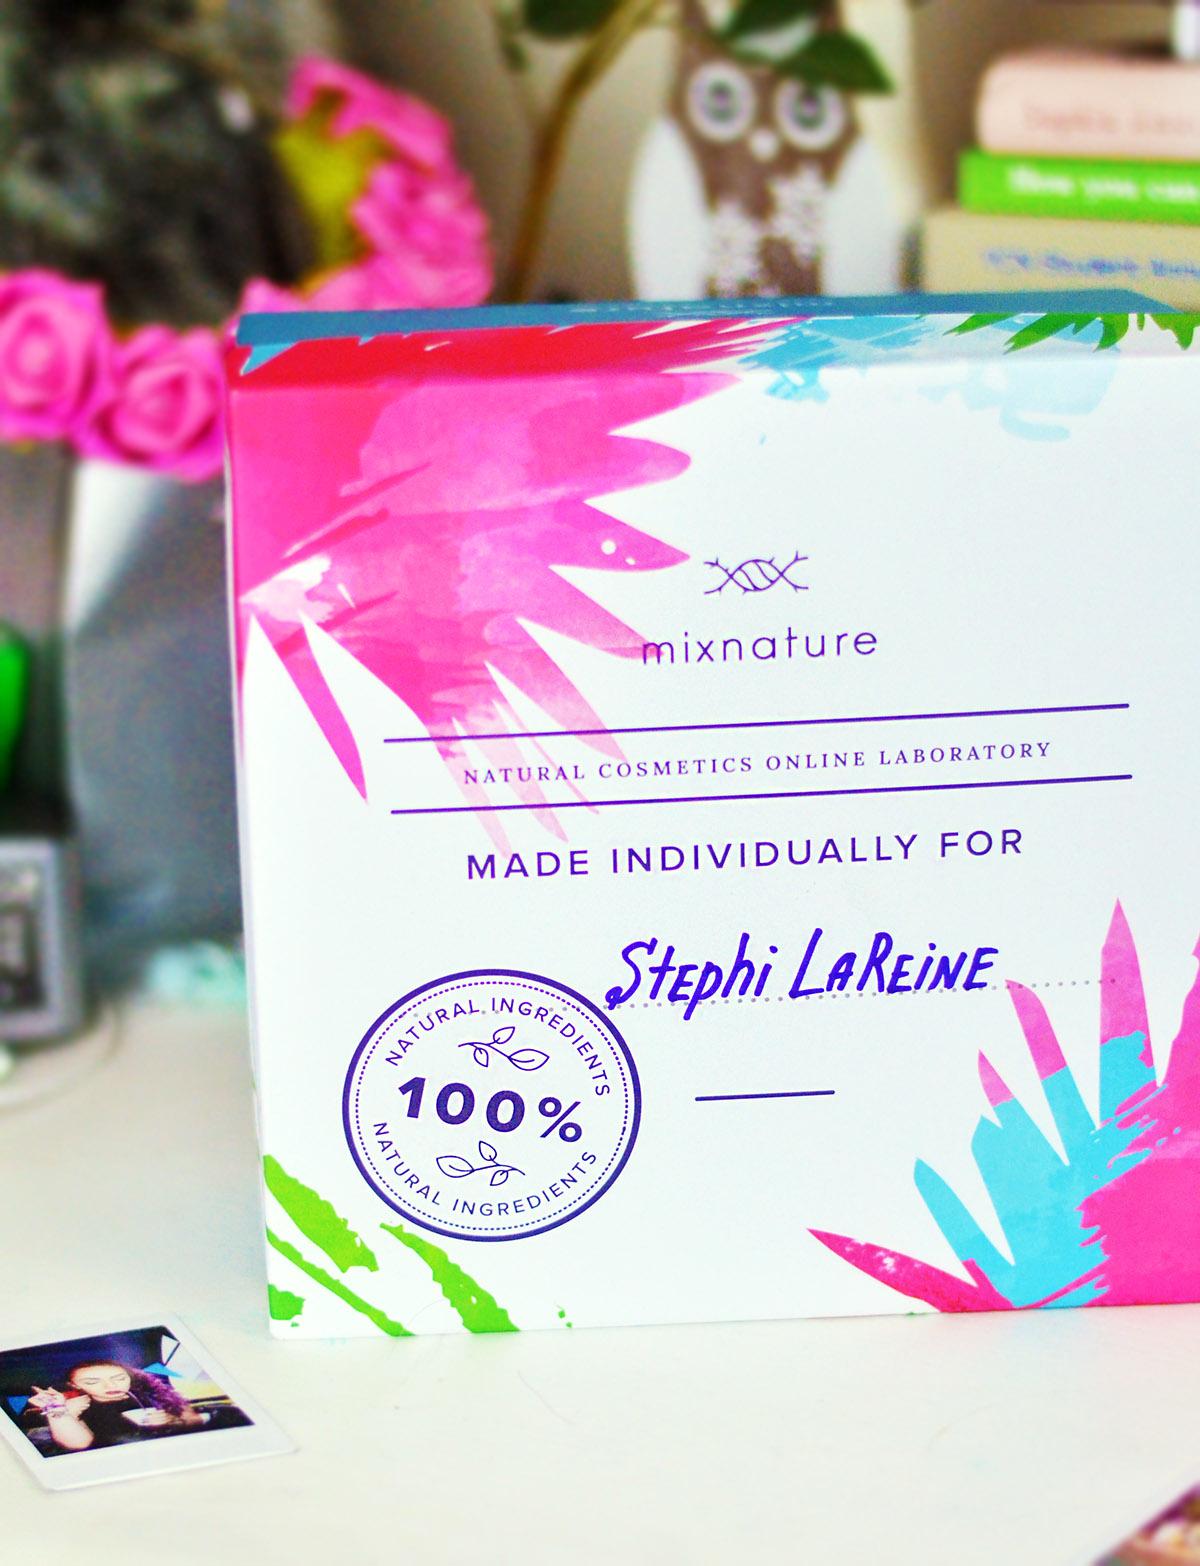 Box for Stephi LaReine